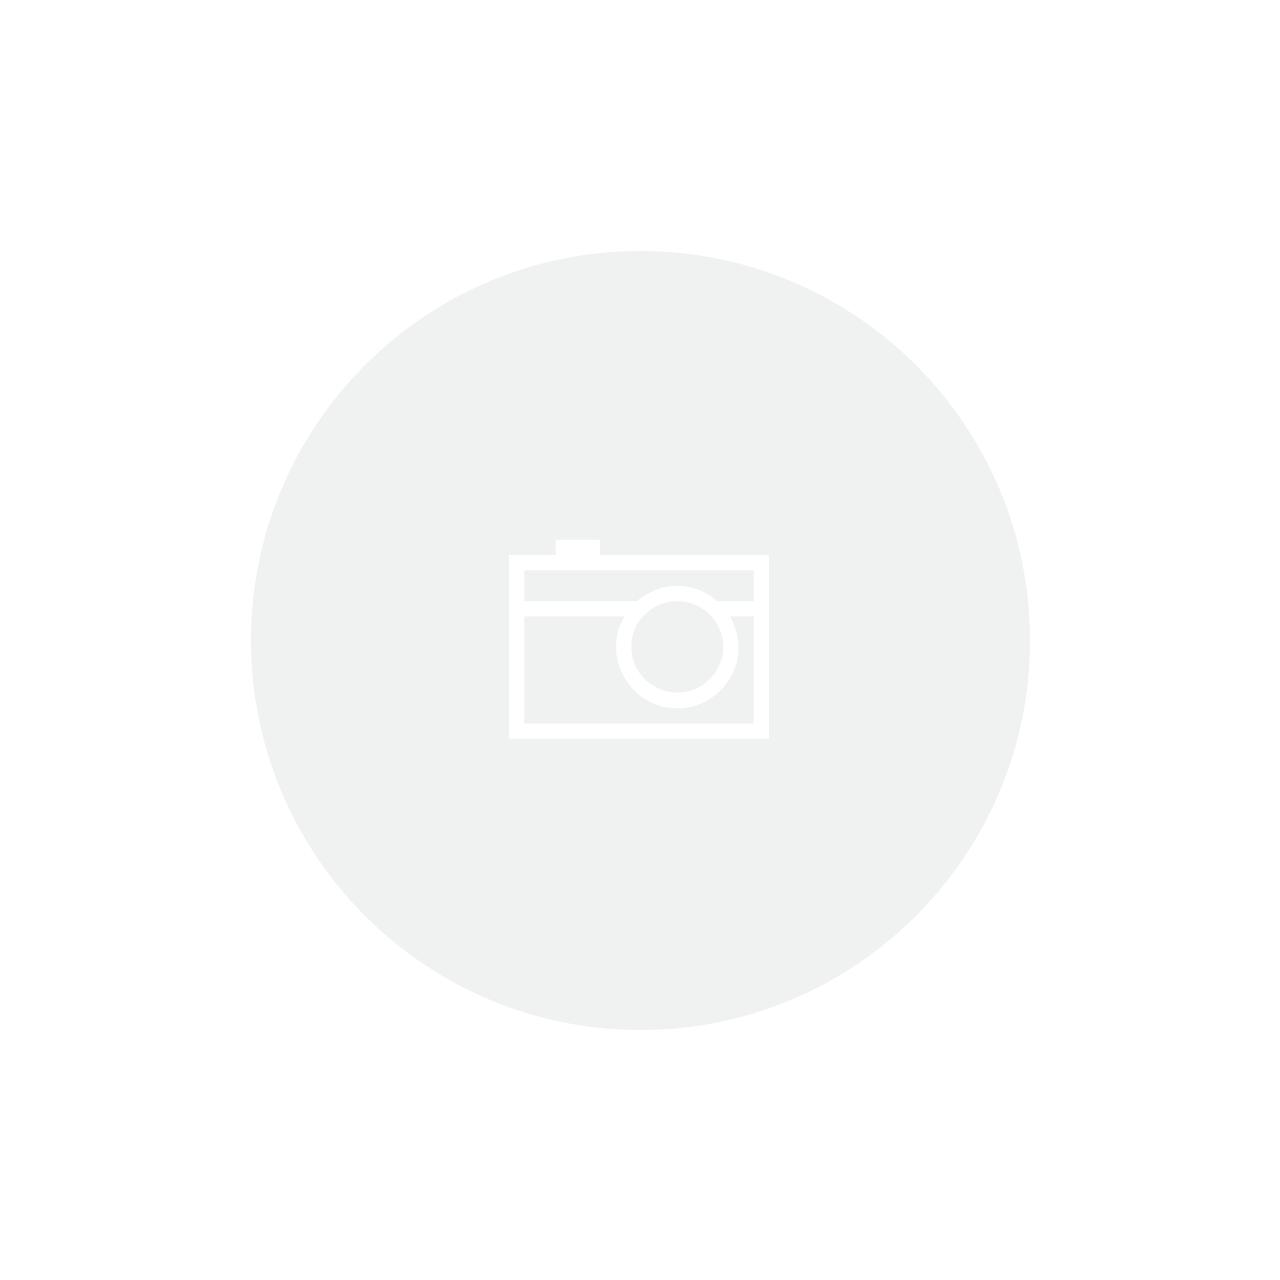 Coifa de Parede New Dritta 90 127v Tramontina